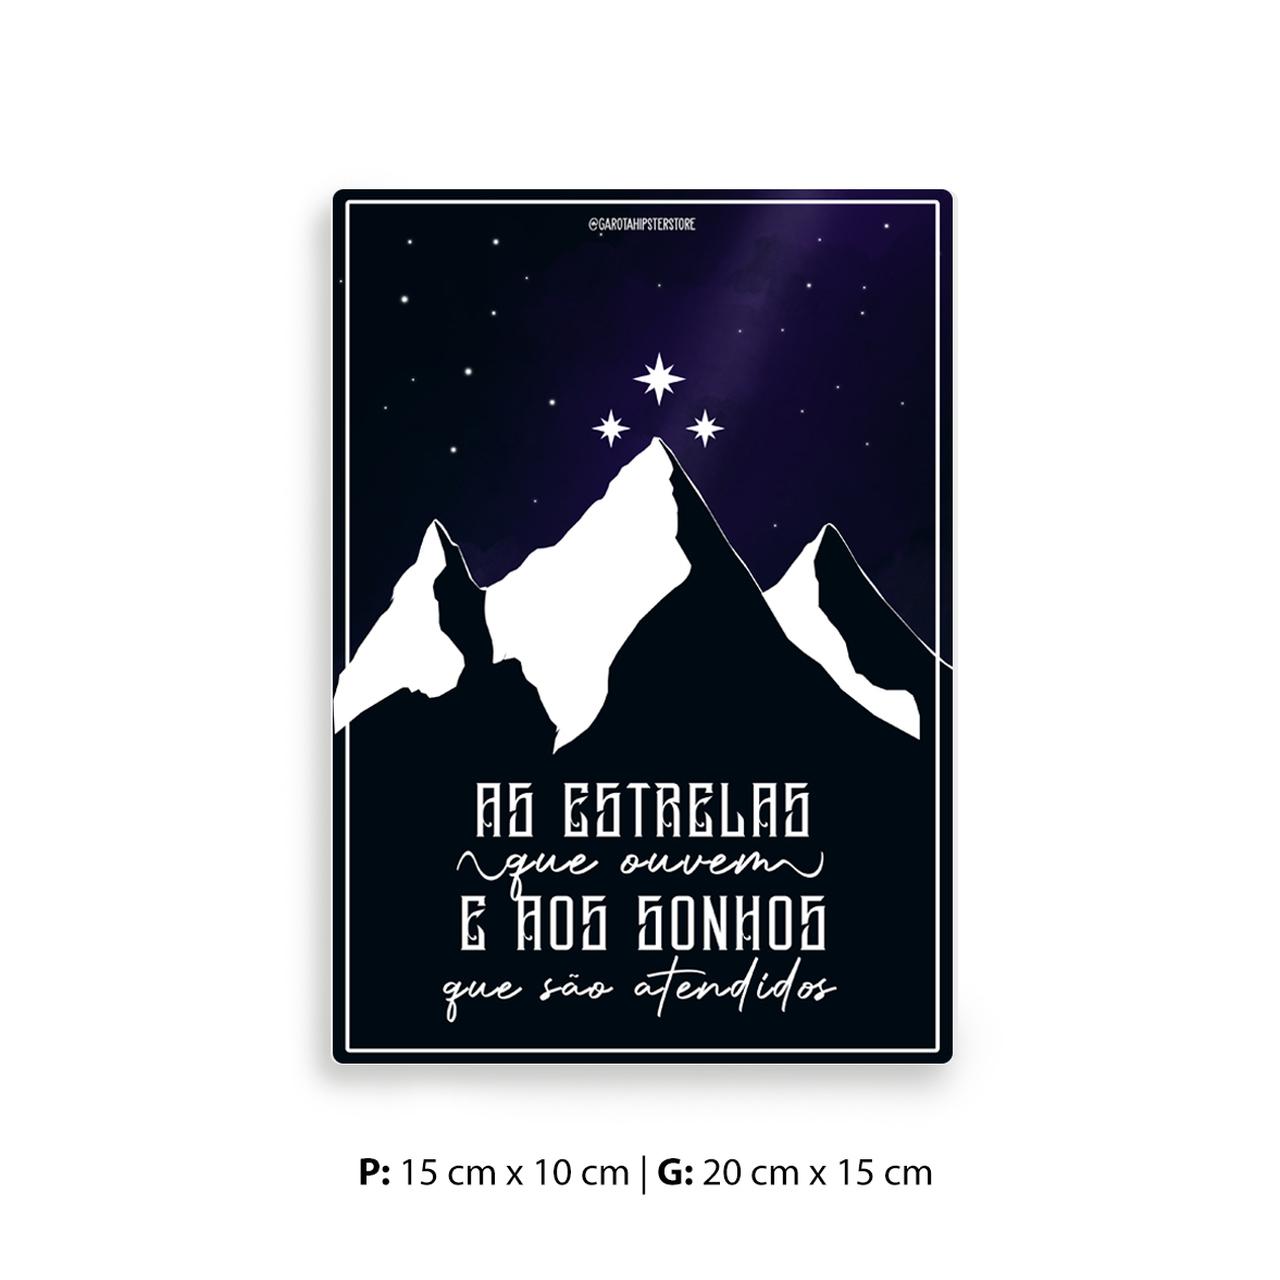 Placa Decorativa Acotar/ Corte Noturna/ Corte dos Sonhos